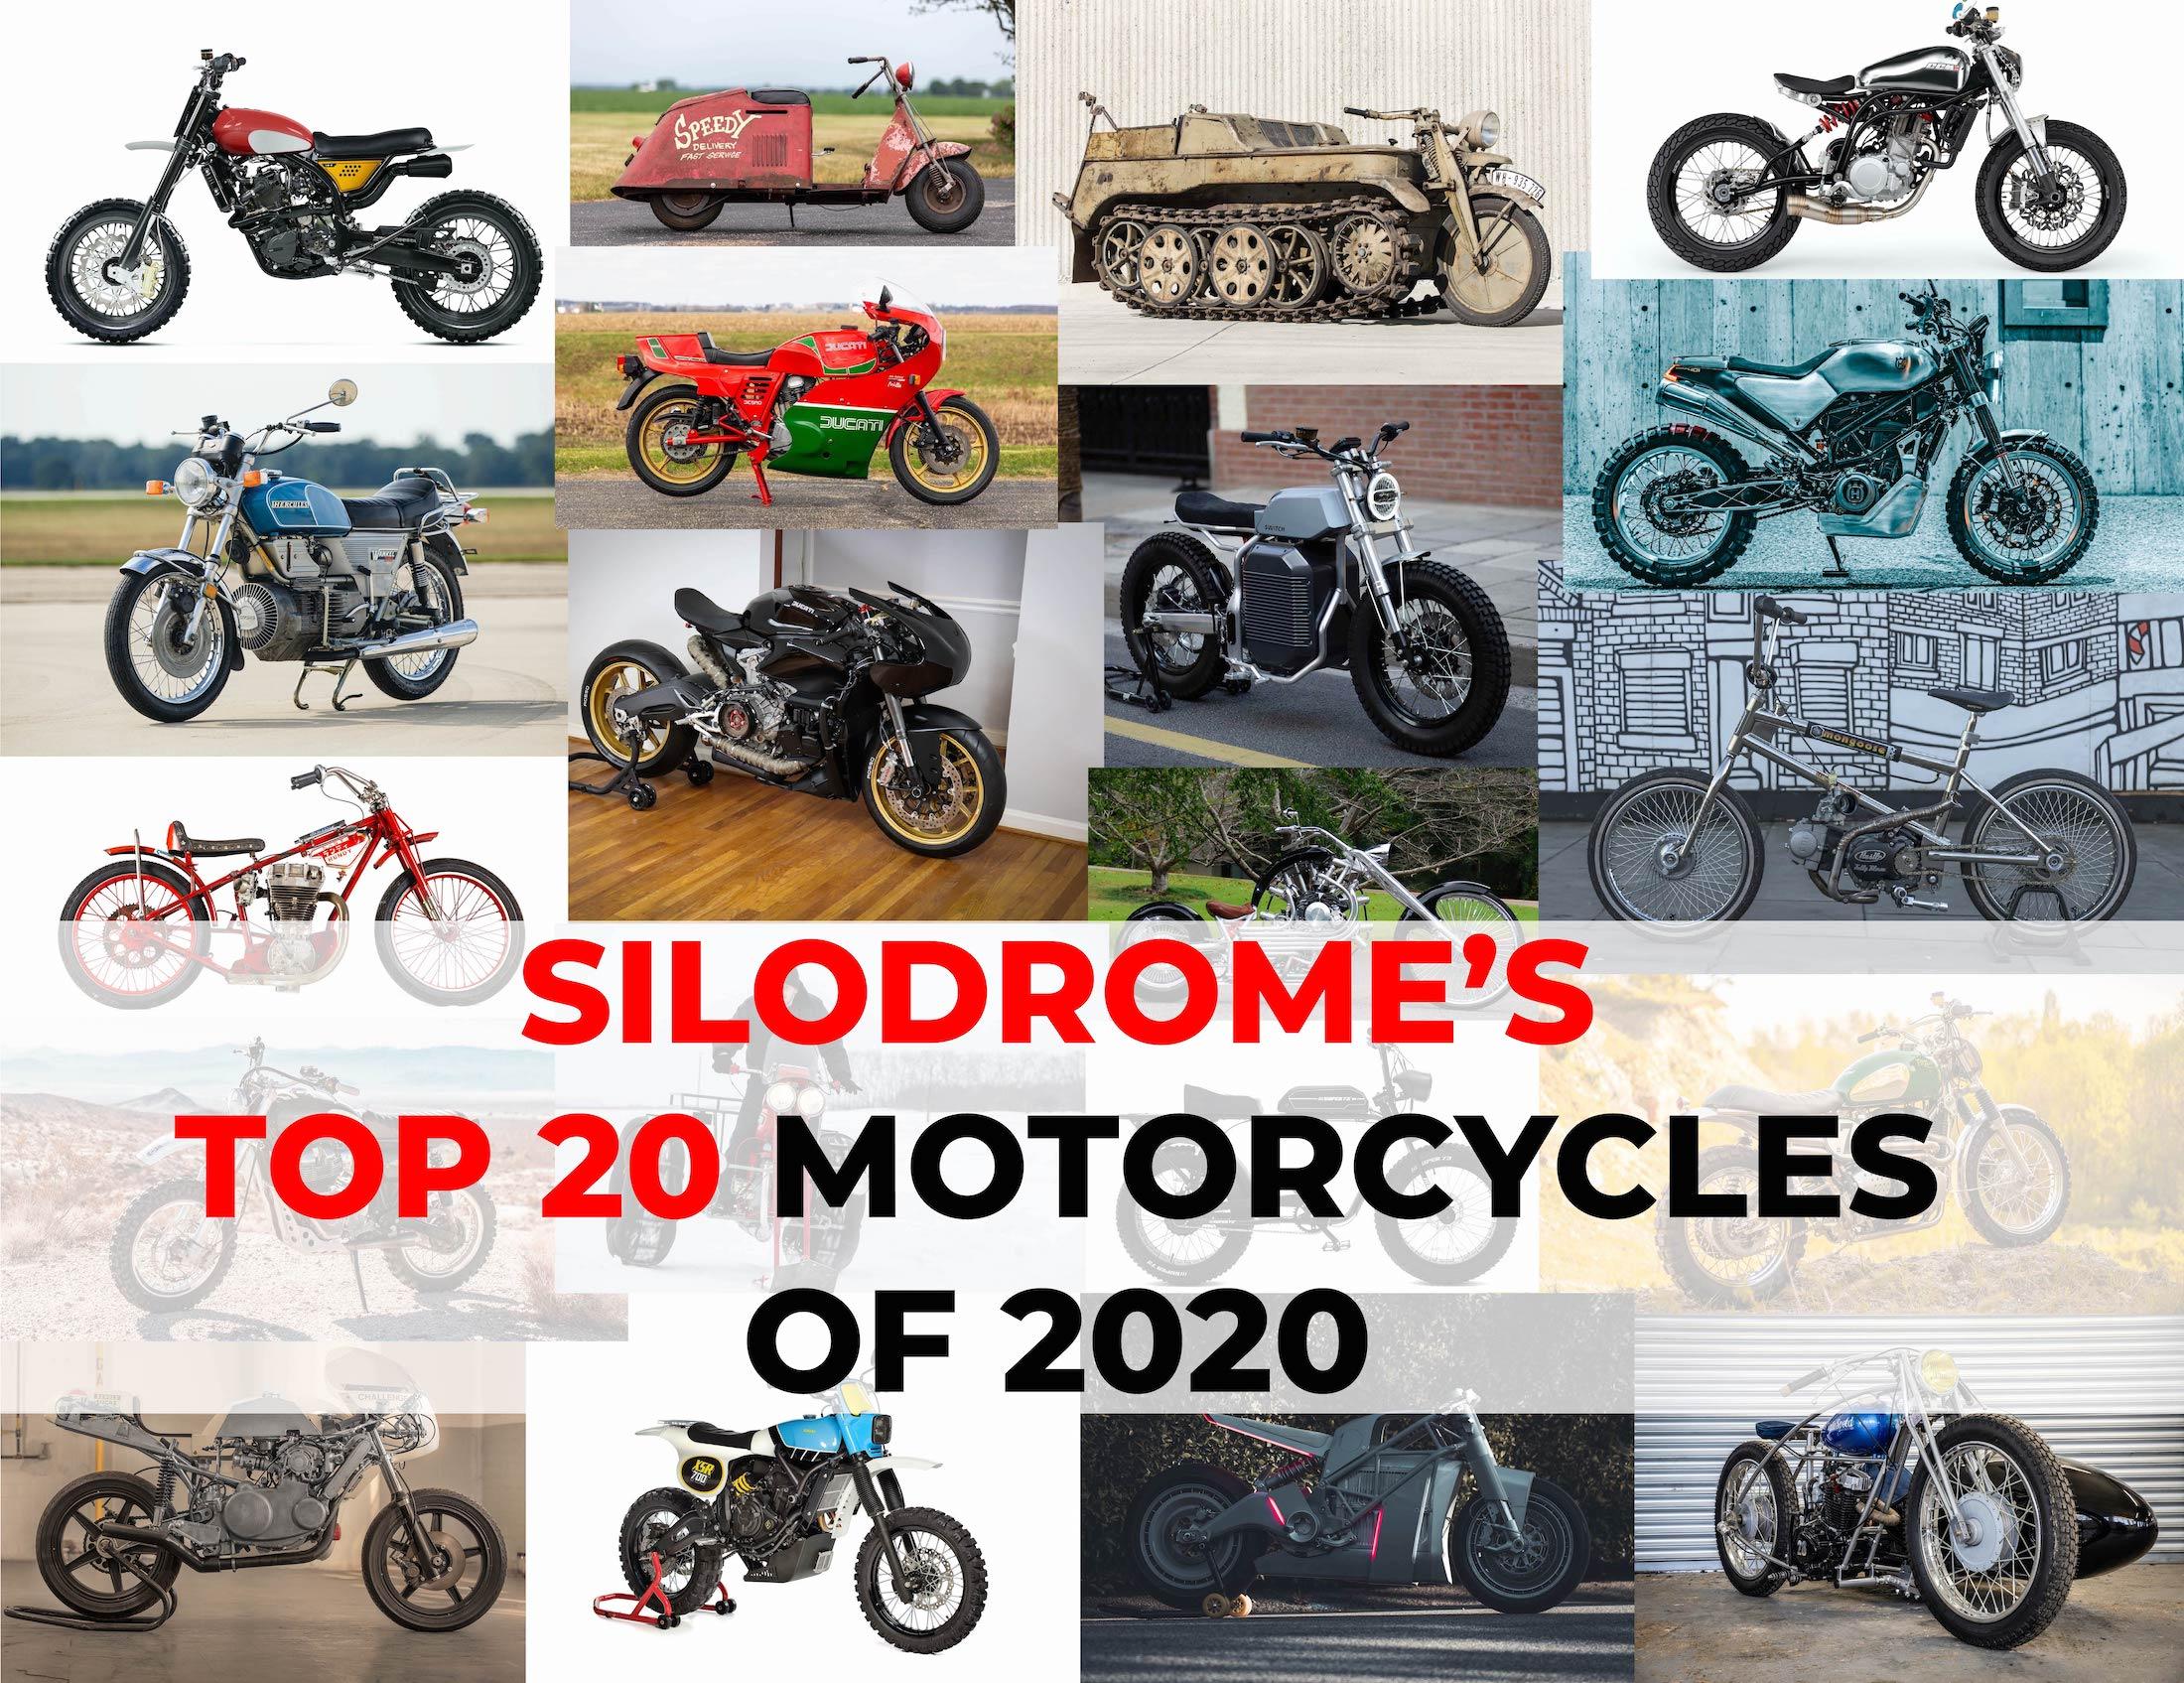 Top 20 Motorcycles of 2020